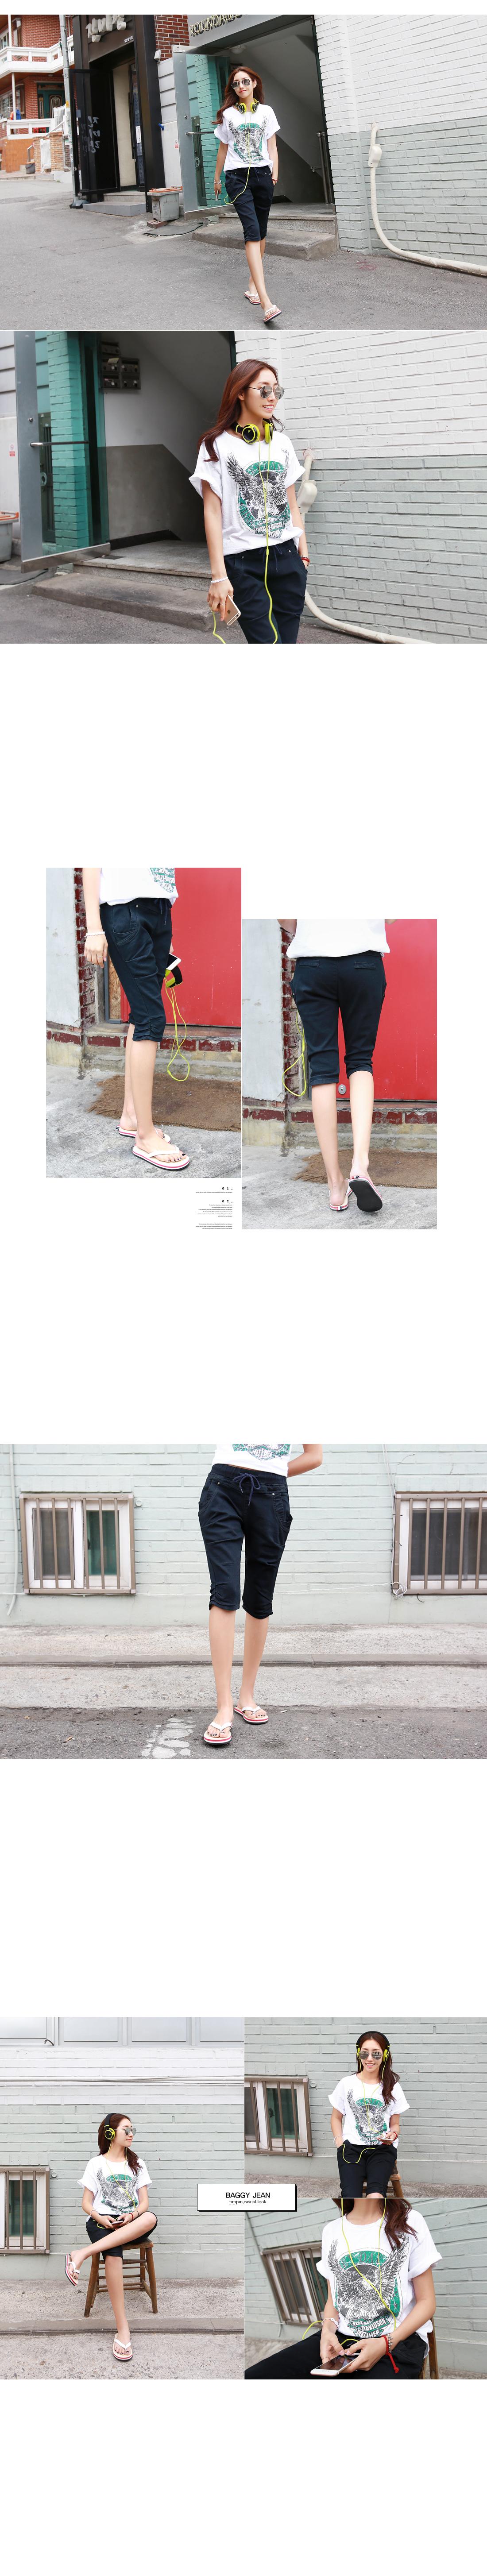 Berk Shirring Exhaust Banding Pants #72976 Navy L Available